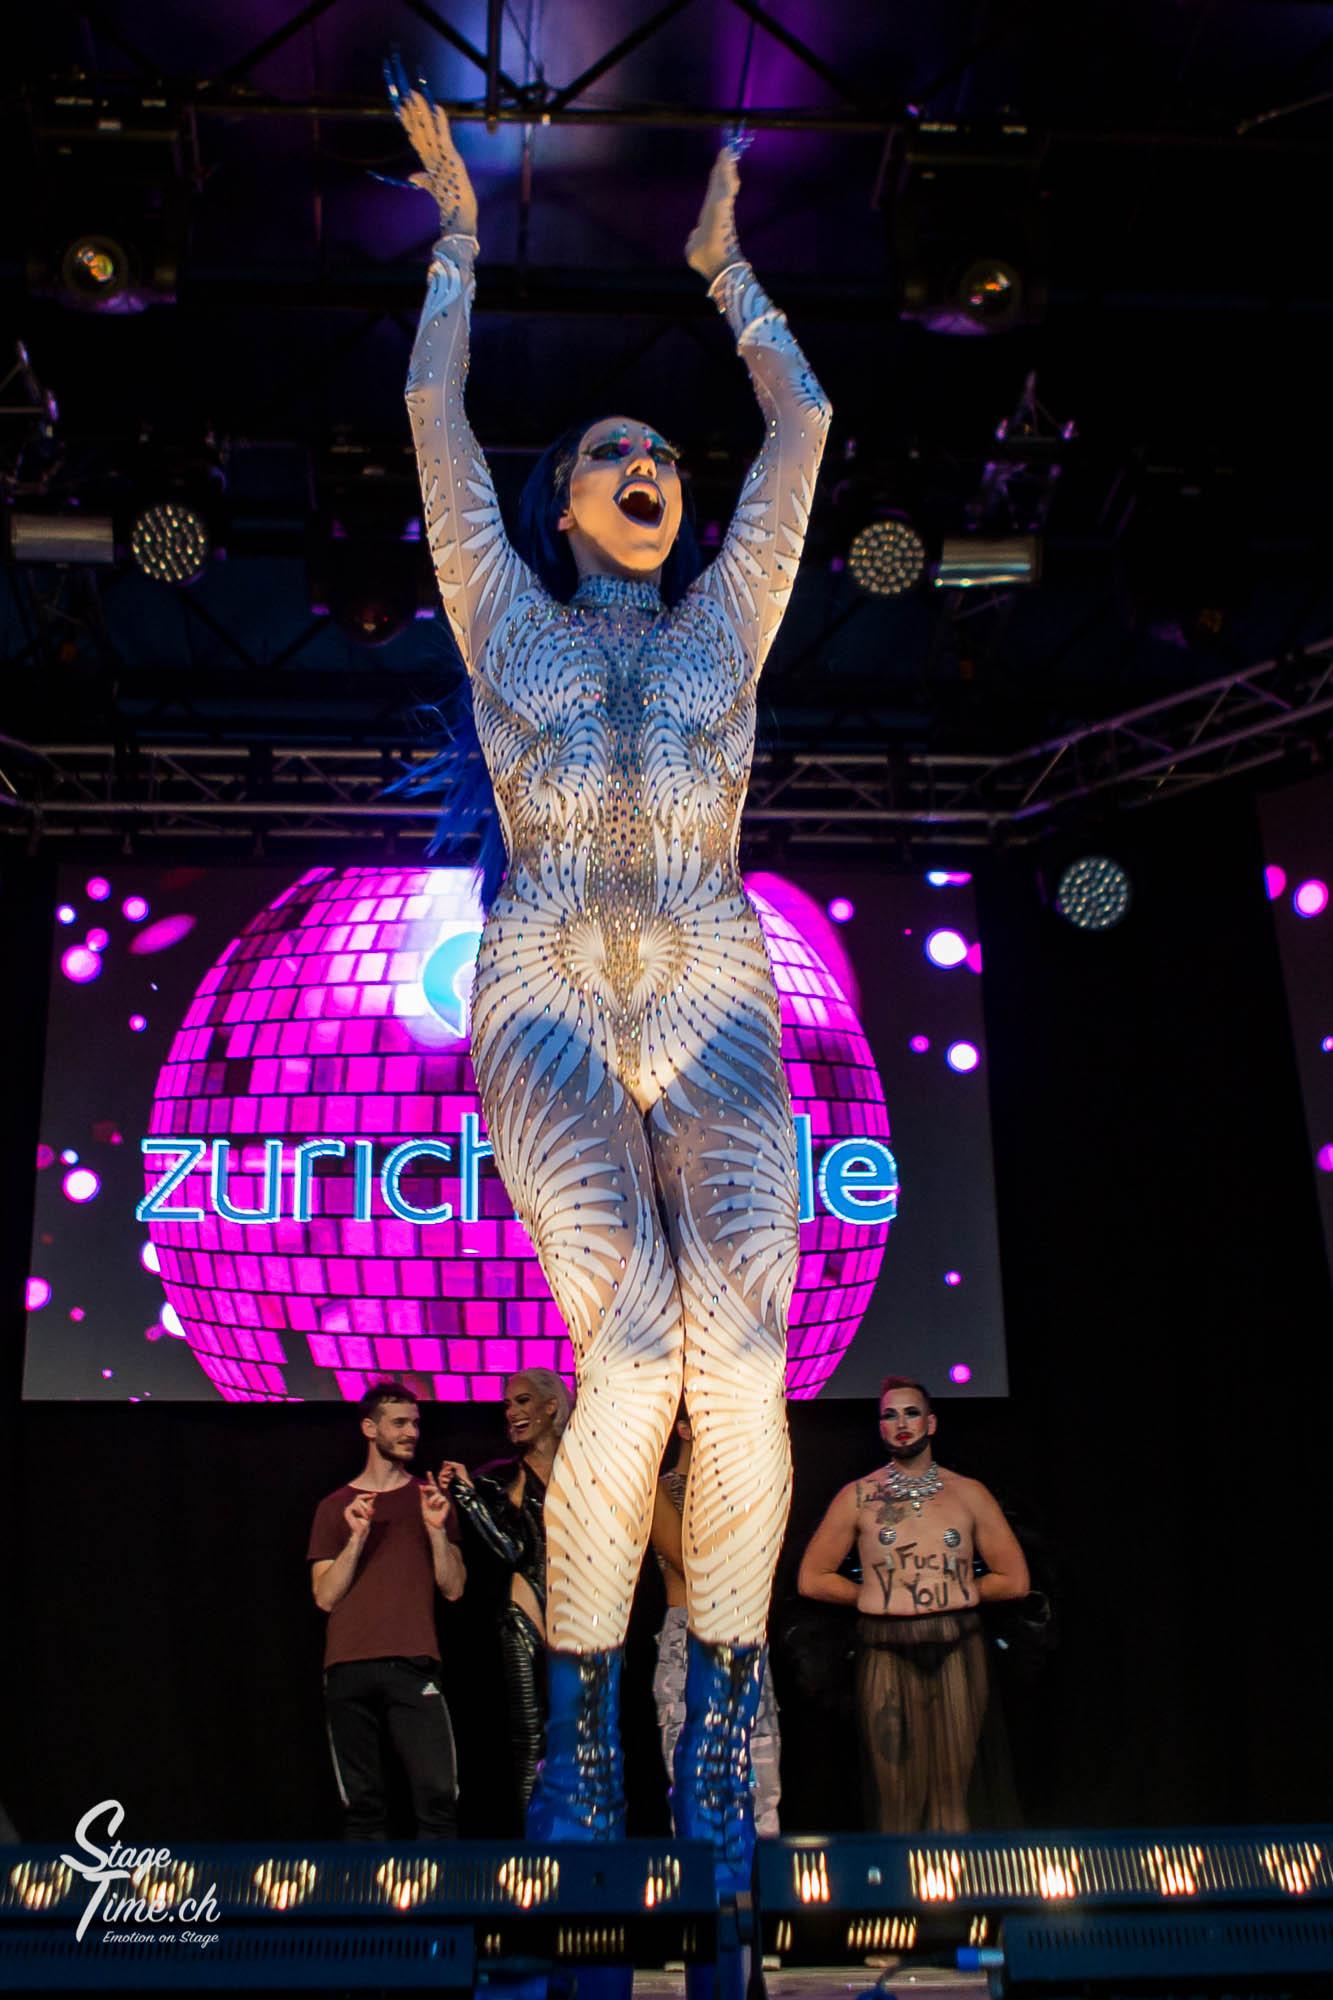 Zurich_Pride_Festival_2018___📷_Christoph_Gurtner___stagetime.ch-43